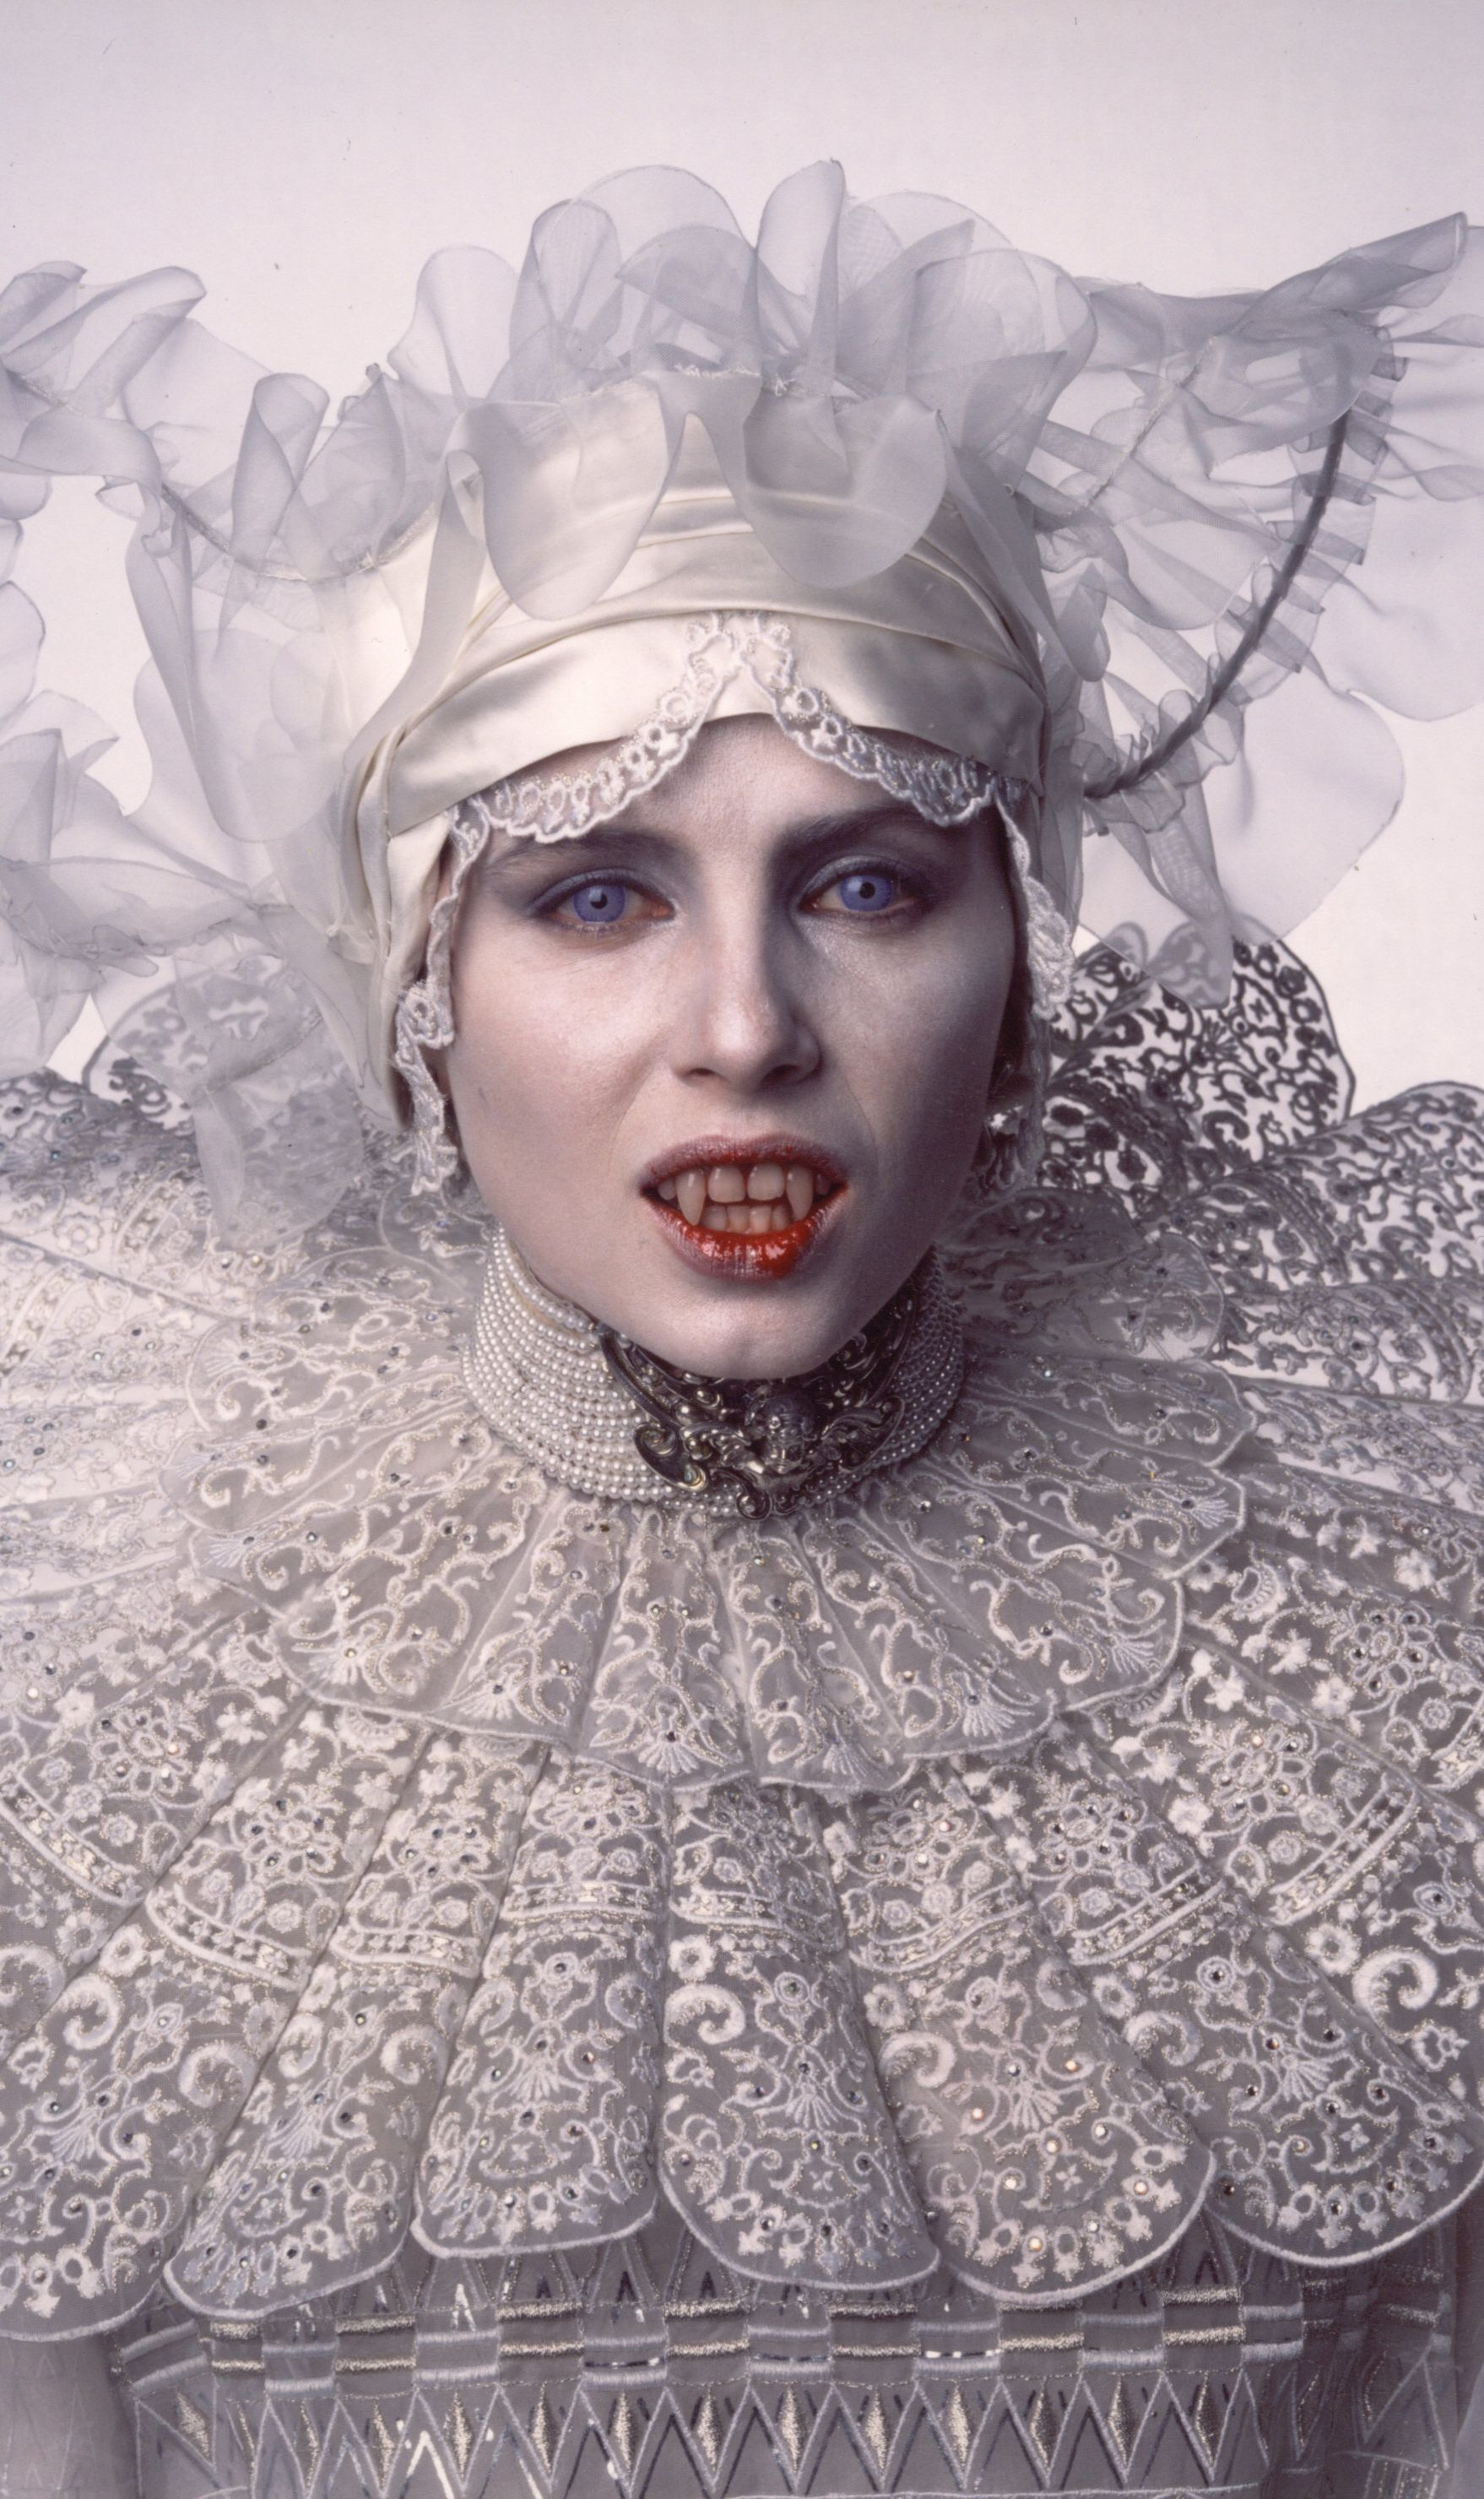 Sadie Frost In Bram Stokers Dracula 1992 Hq